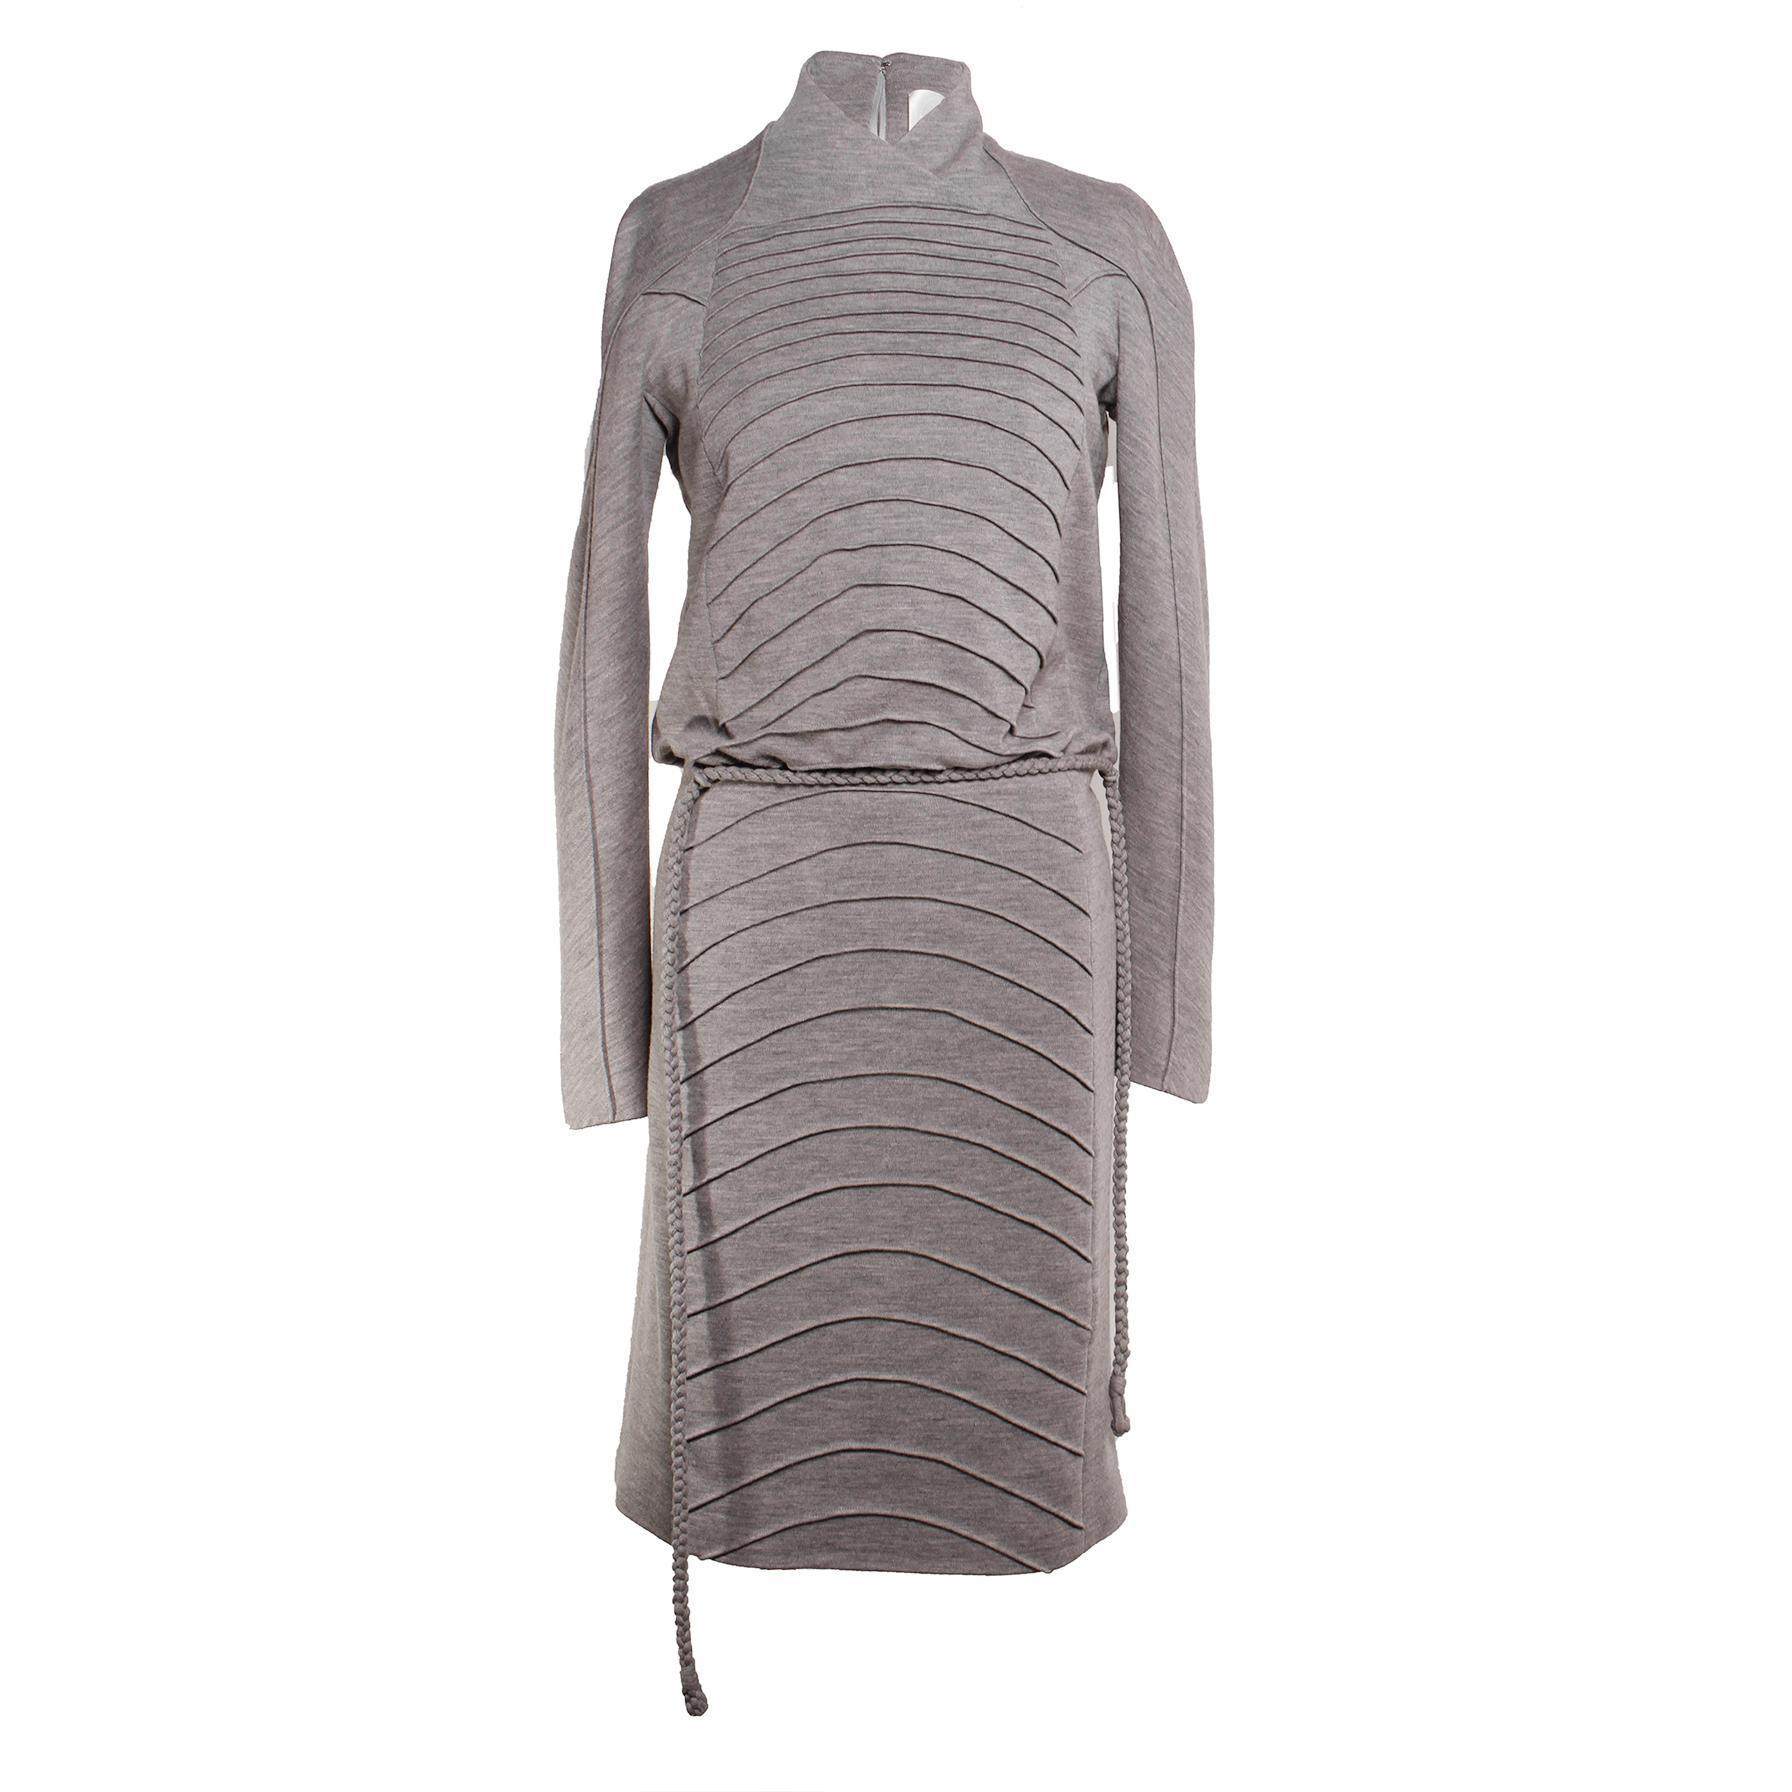 Chado Ralph Rucci Size 2 Pin Pleat Dress